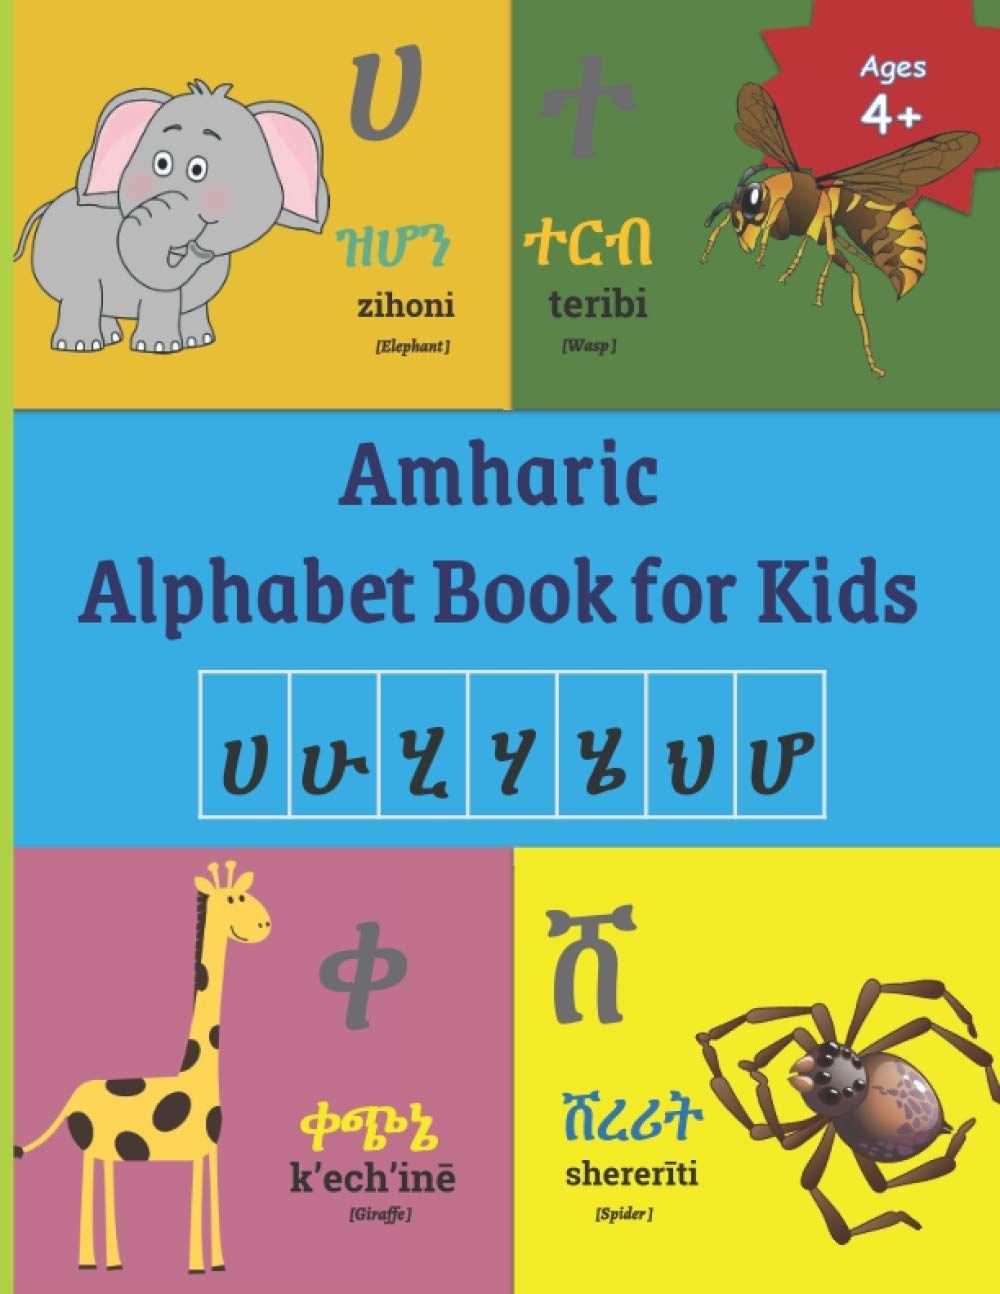 Amharic Alphabet Book For Kids Amharic Alphabet Practice Workbook Learn Trace And Write Amharic Alphabet Book Alphabet Practice Workbook [ 1294 x 1000 Pixel ]